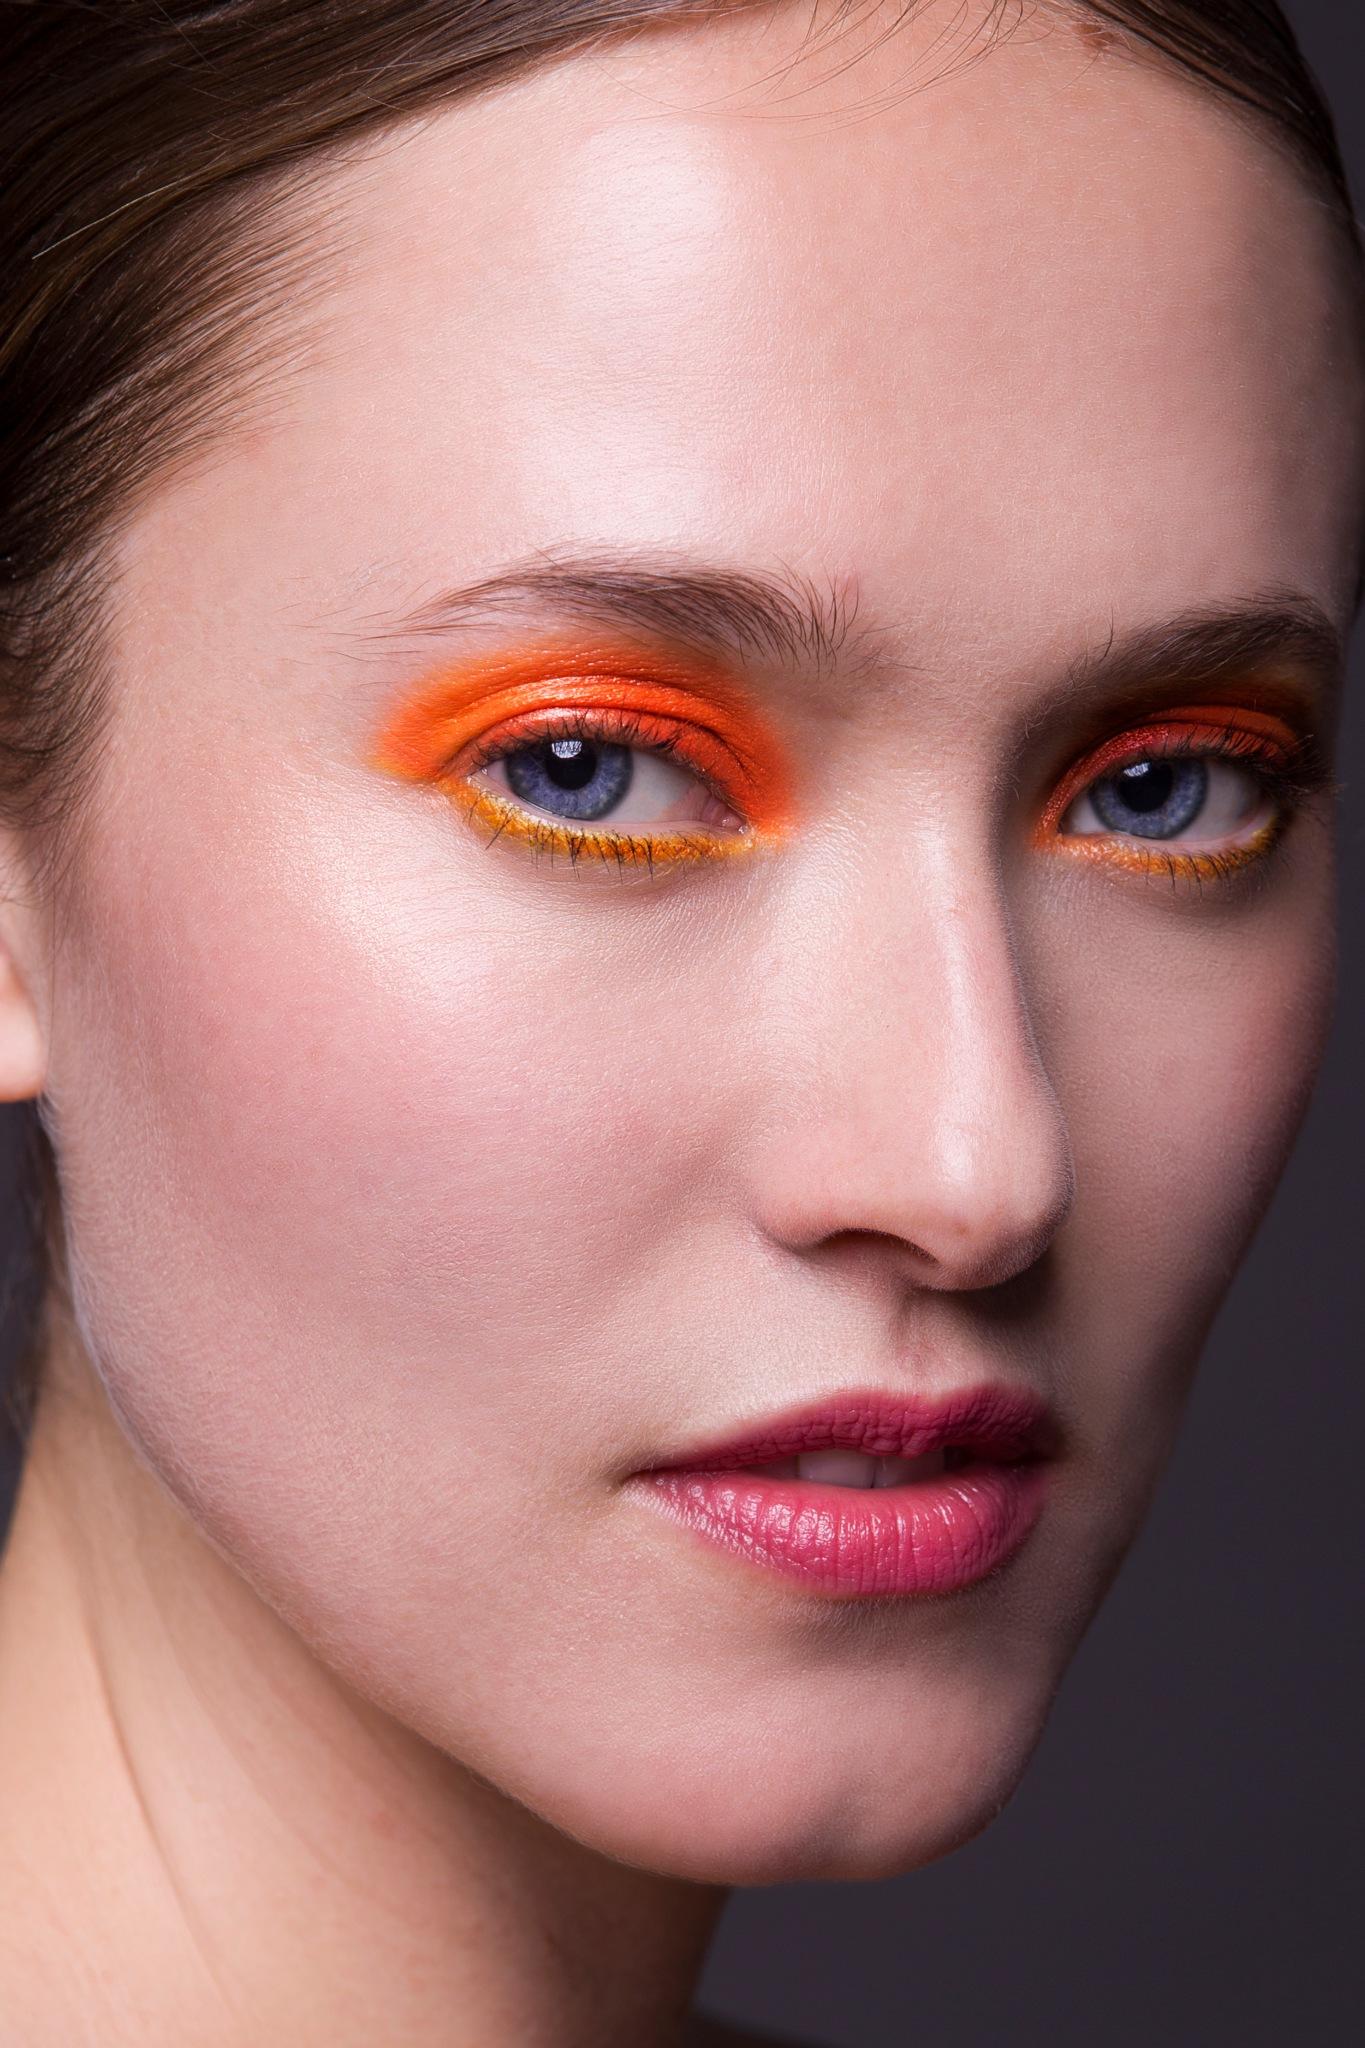 Orange by Arantxa Vidal